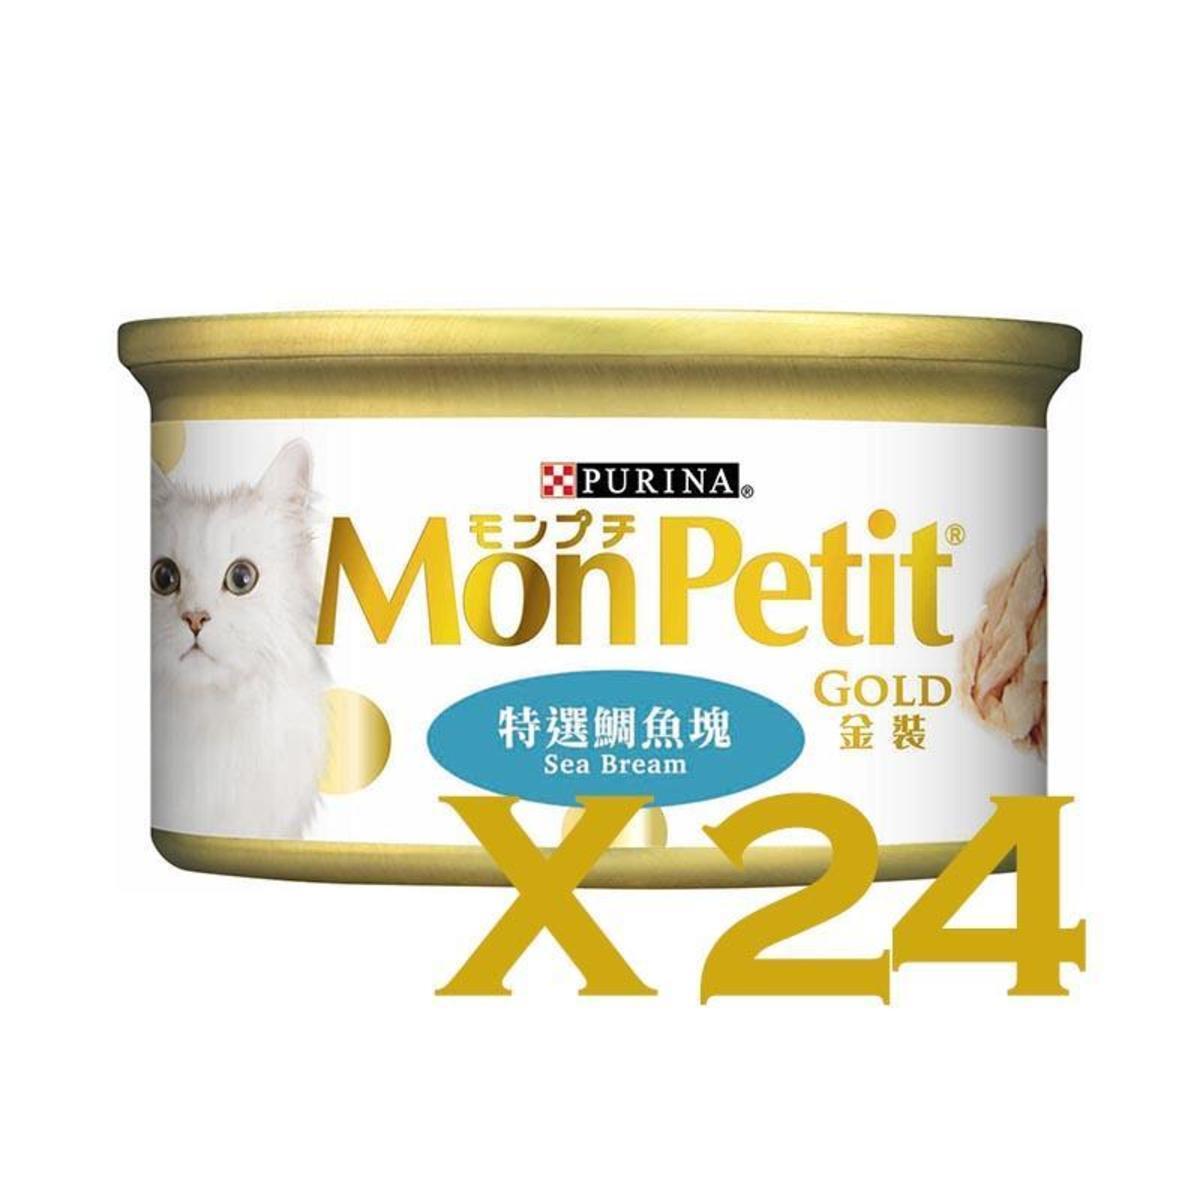 Gold金裝肉凍系列金裝特選鯛魚塊罐頭85g-24罐